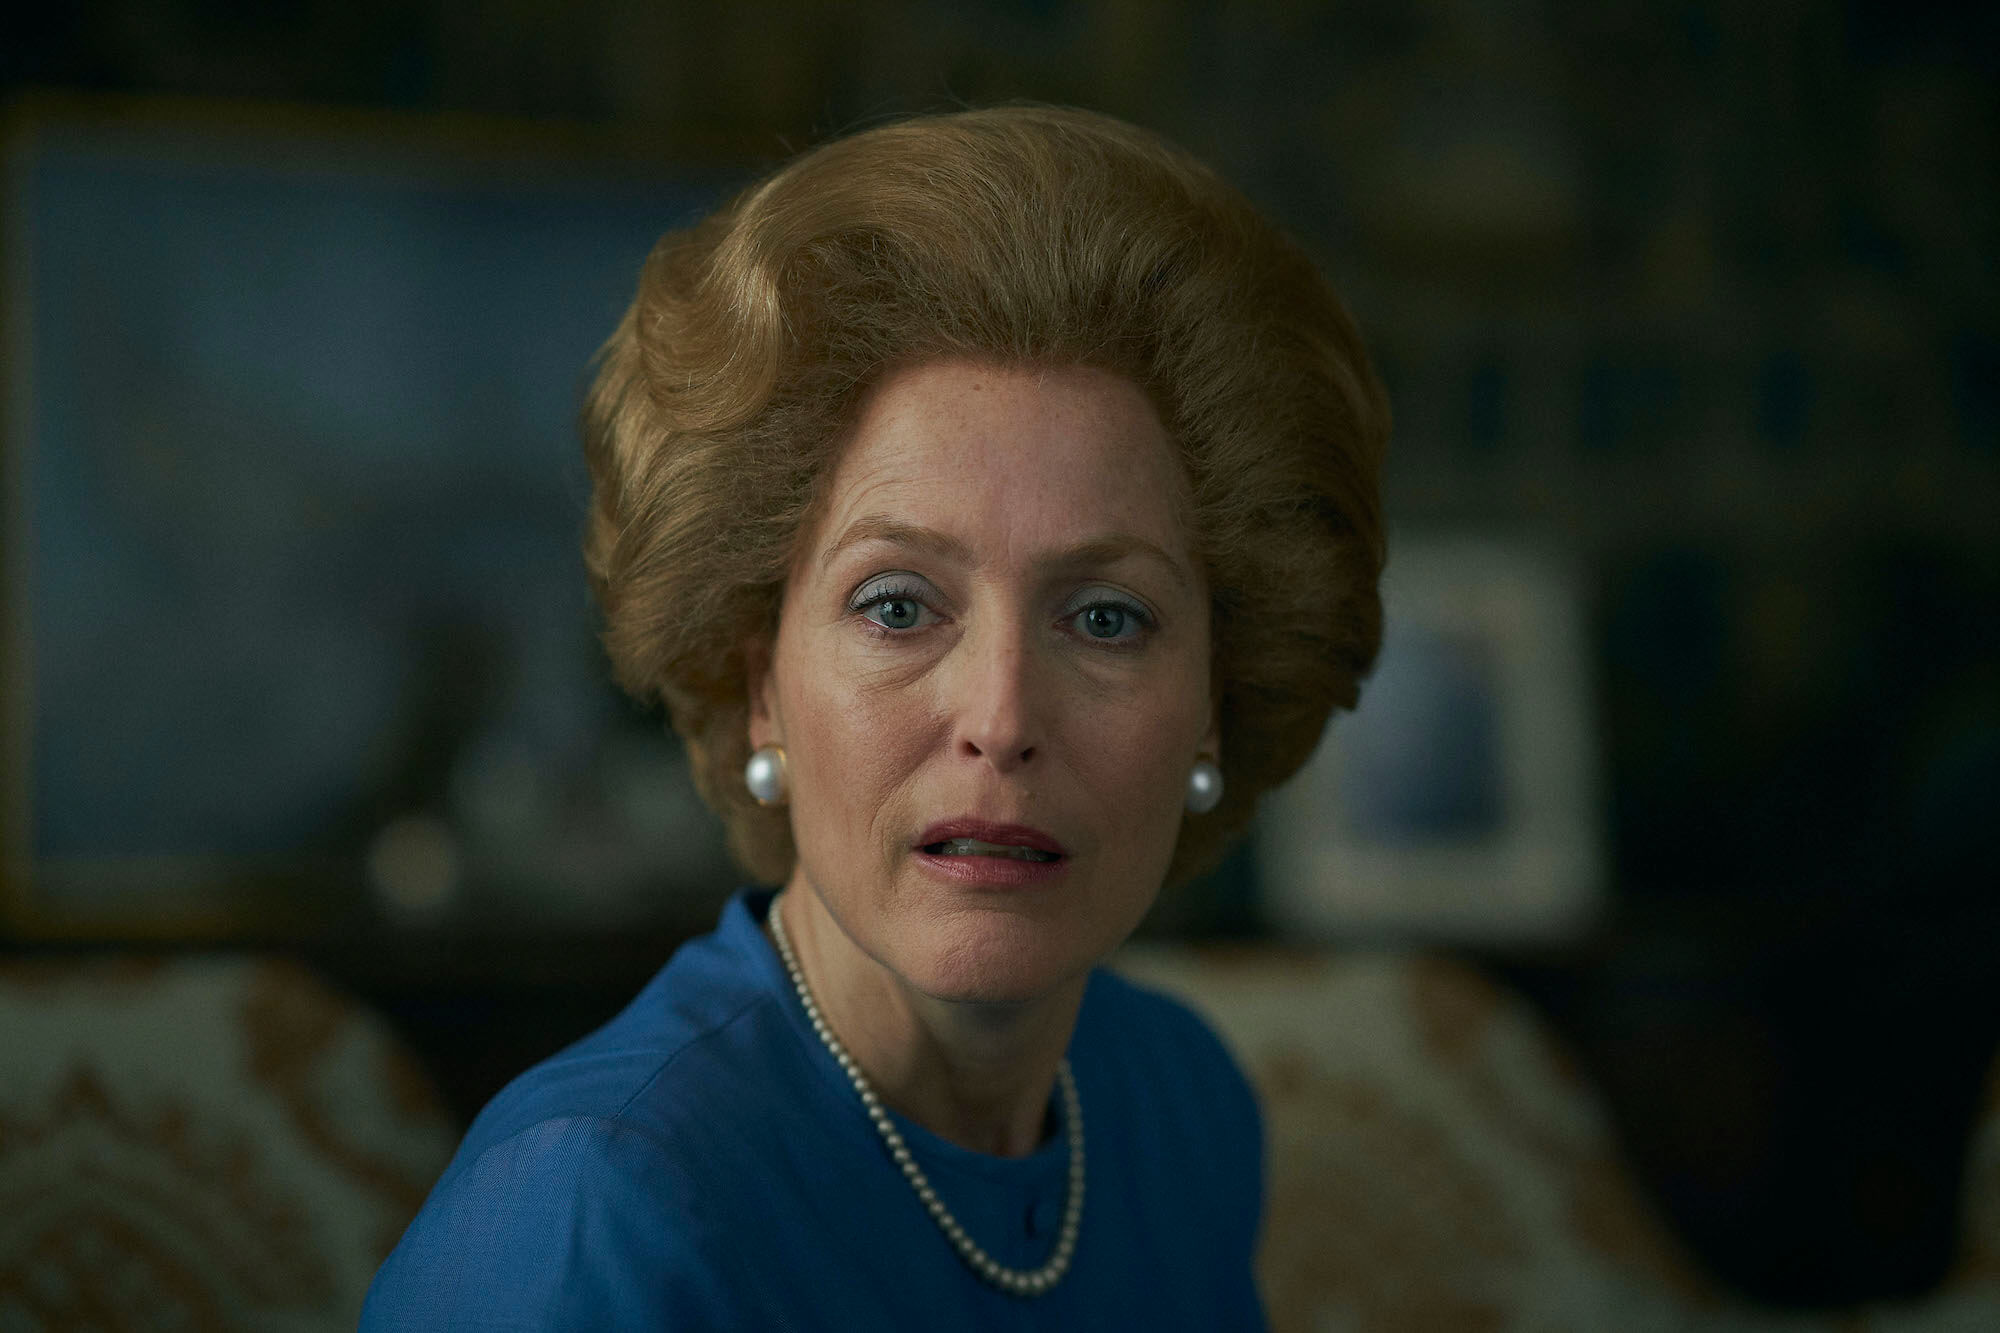 Gillian Anderson as Margaret Thatcher season 4 The Crown